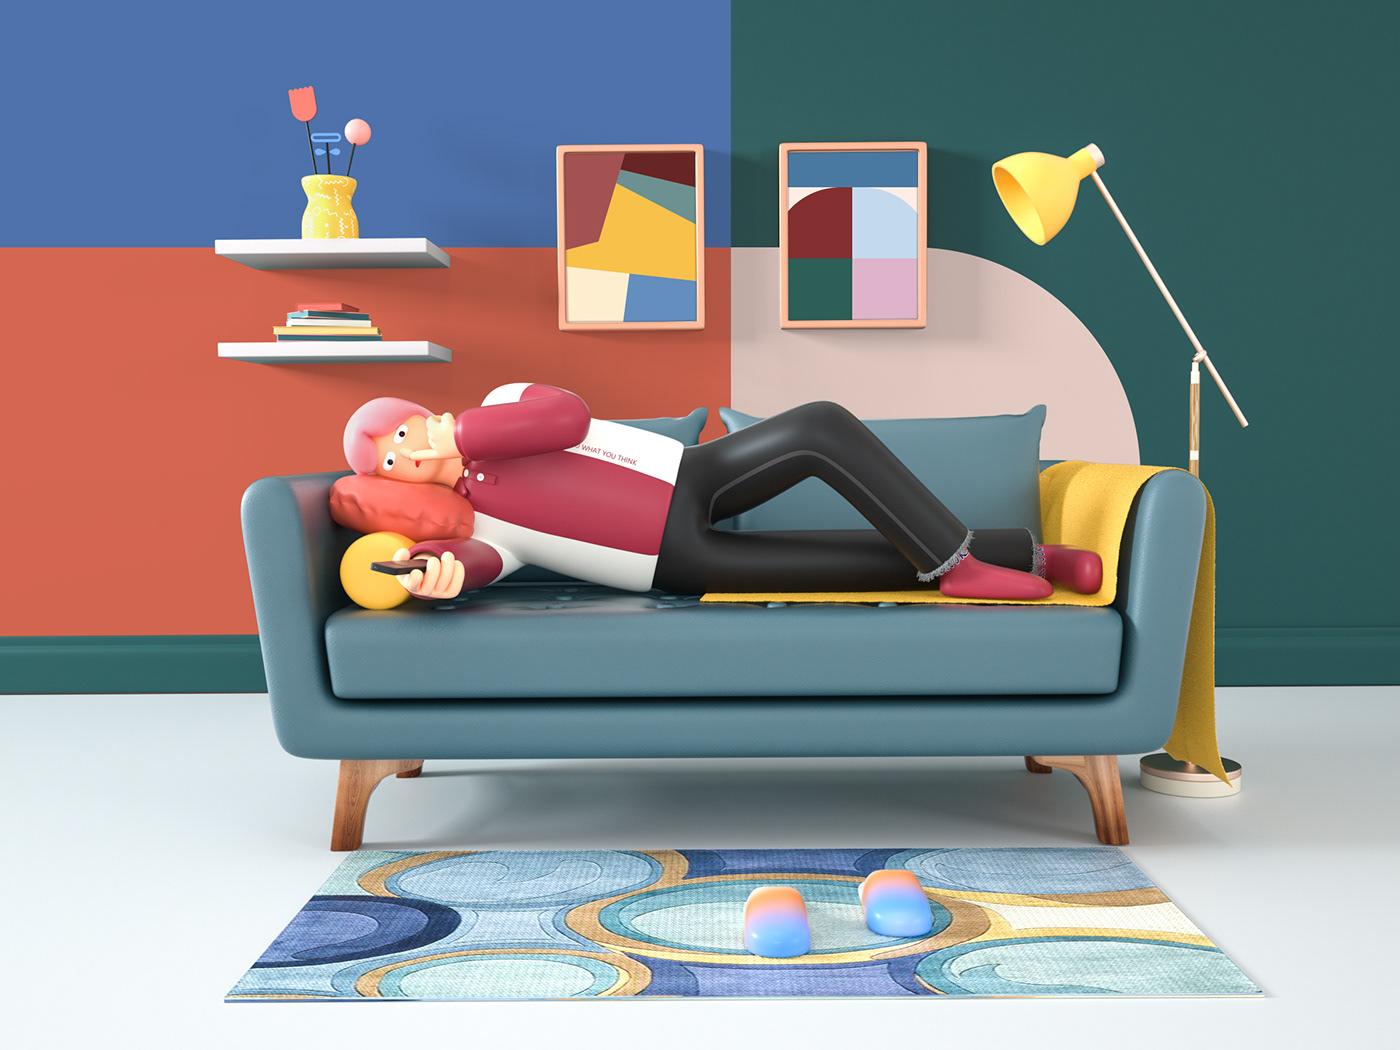 Image may contain: cartoon, screenshot and furniture